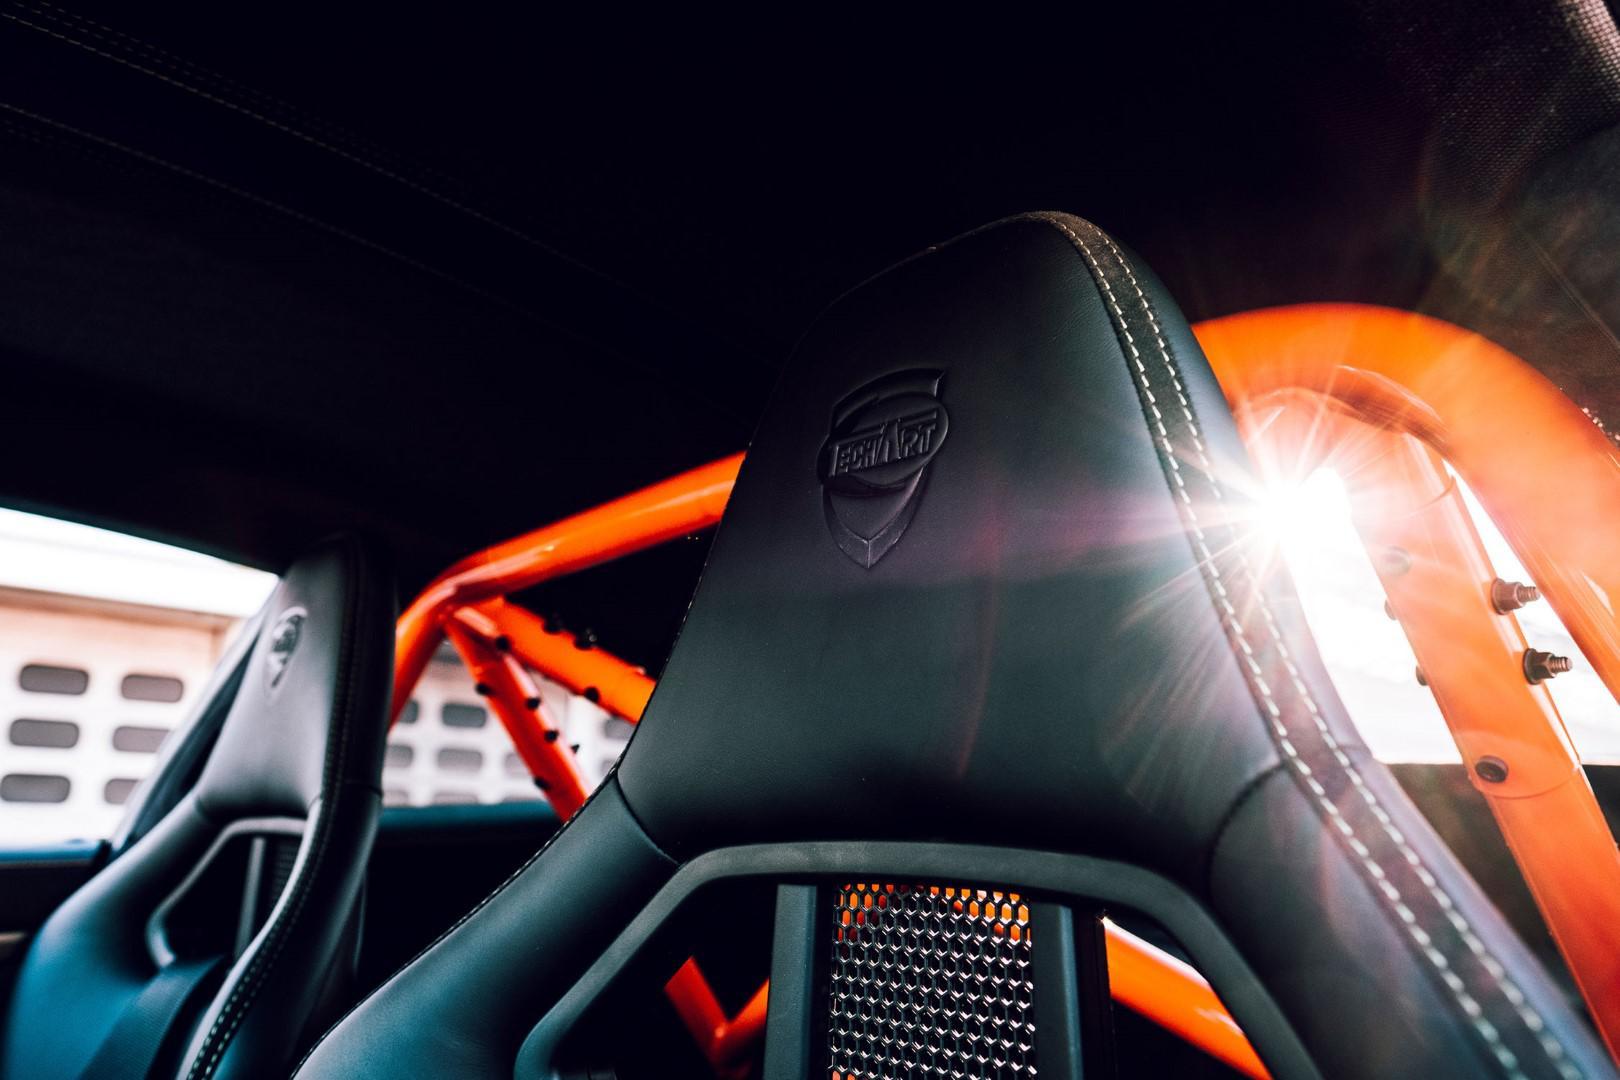 10-exemplaires-seulement-porsche-911-turbo-s-gtstreet-rs-by-techart-1049-5.jpg